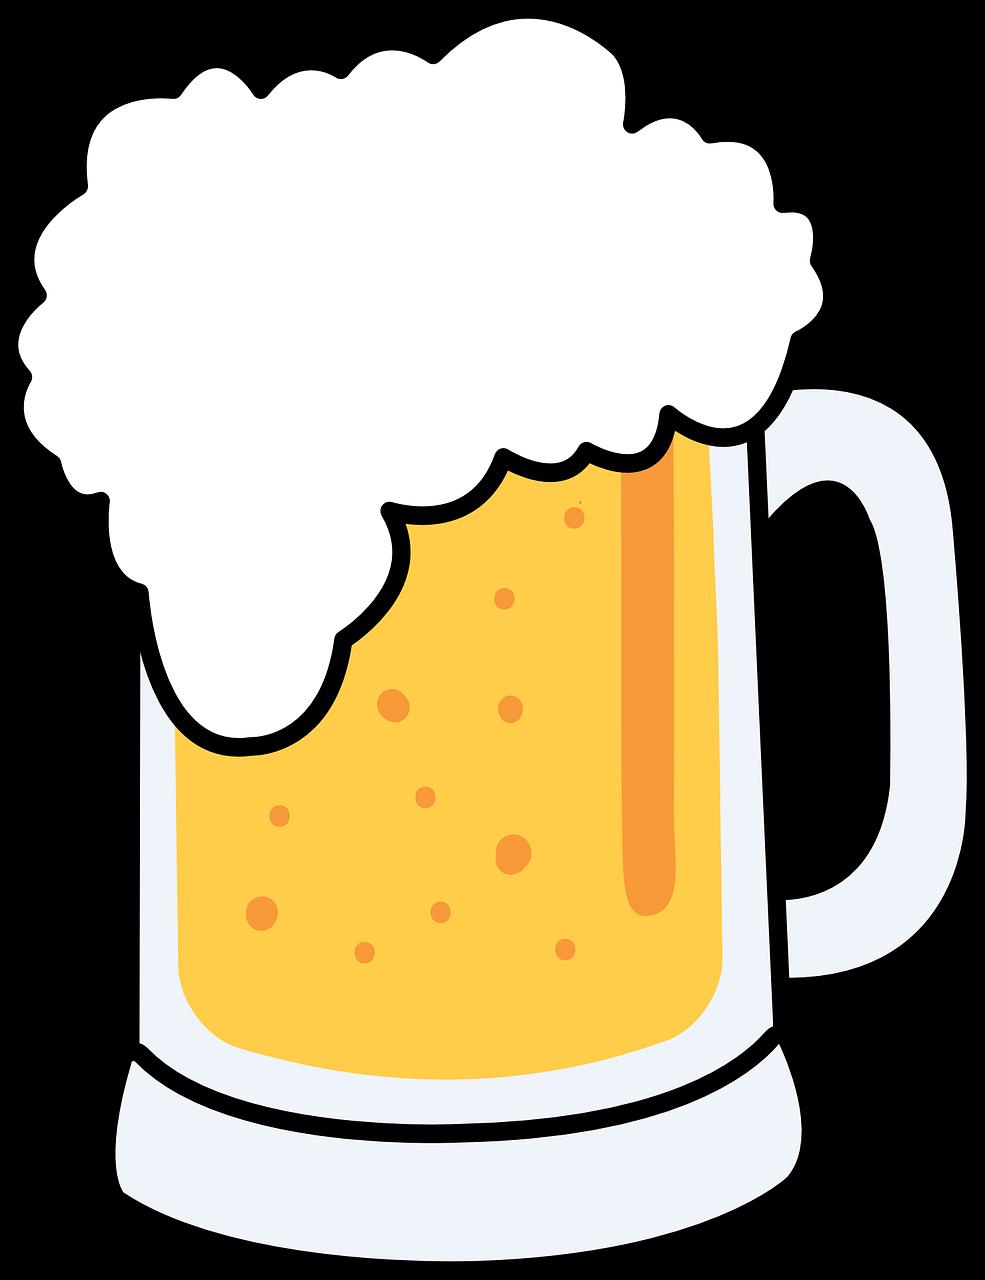 Free Cartoon Beer Mug Clip Art-Free Cartoon Beer Mug Clip Art-1